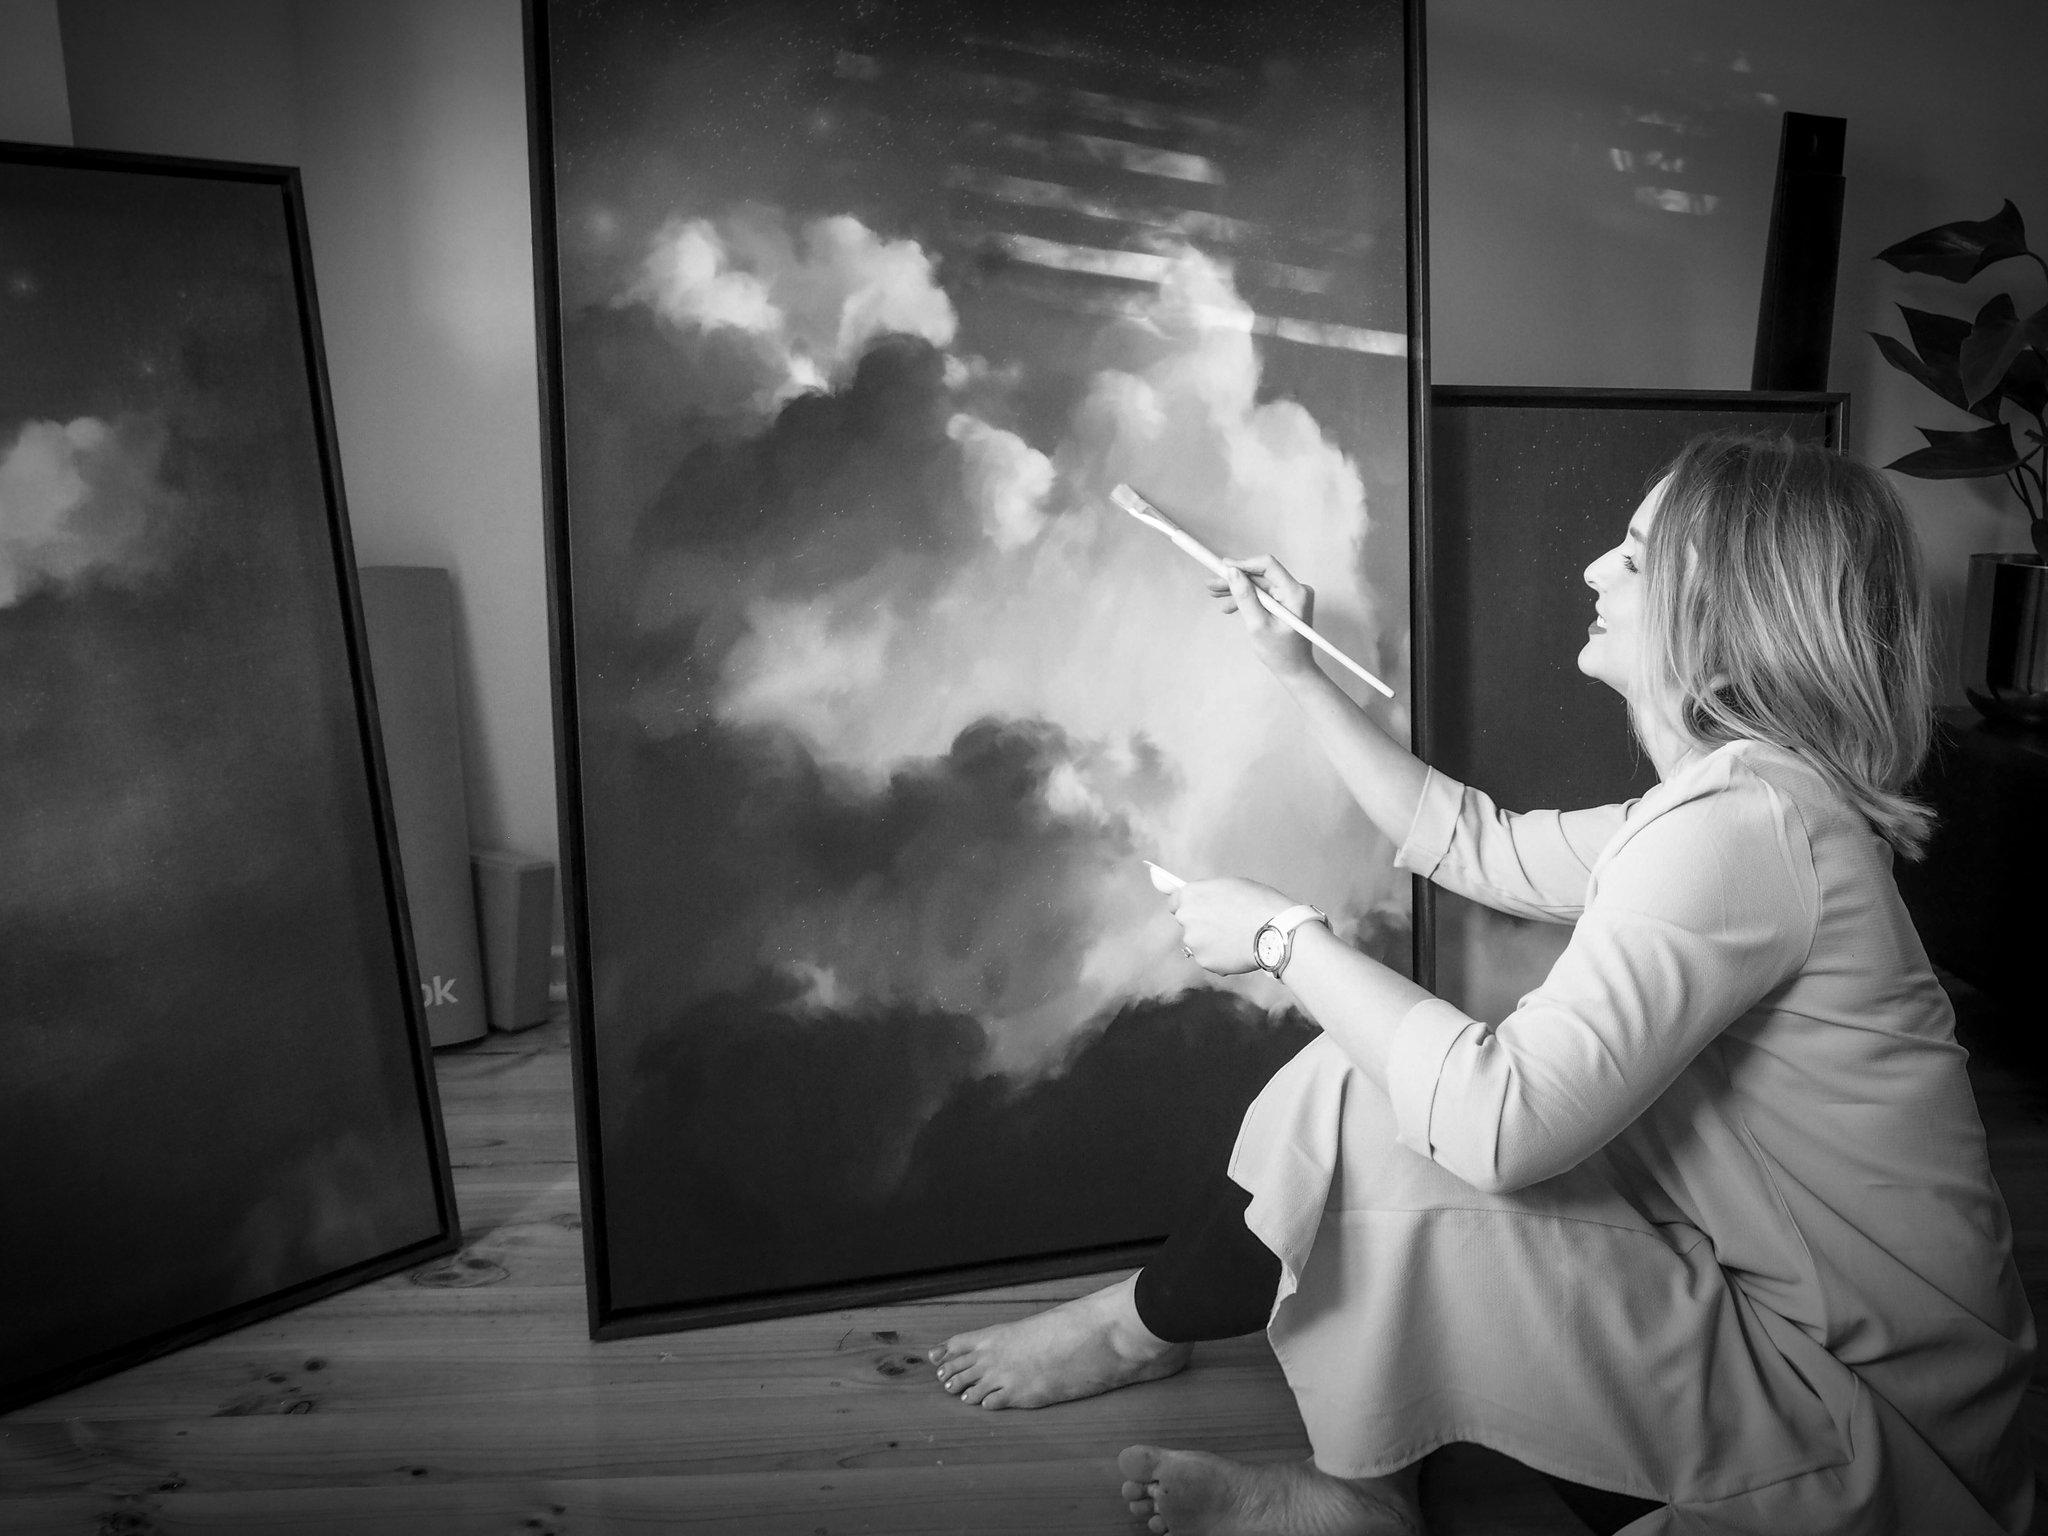 32._About_Corinne_Melanie_-_Painting_Art_2048x2048.jpg